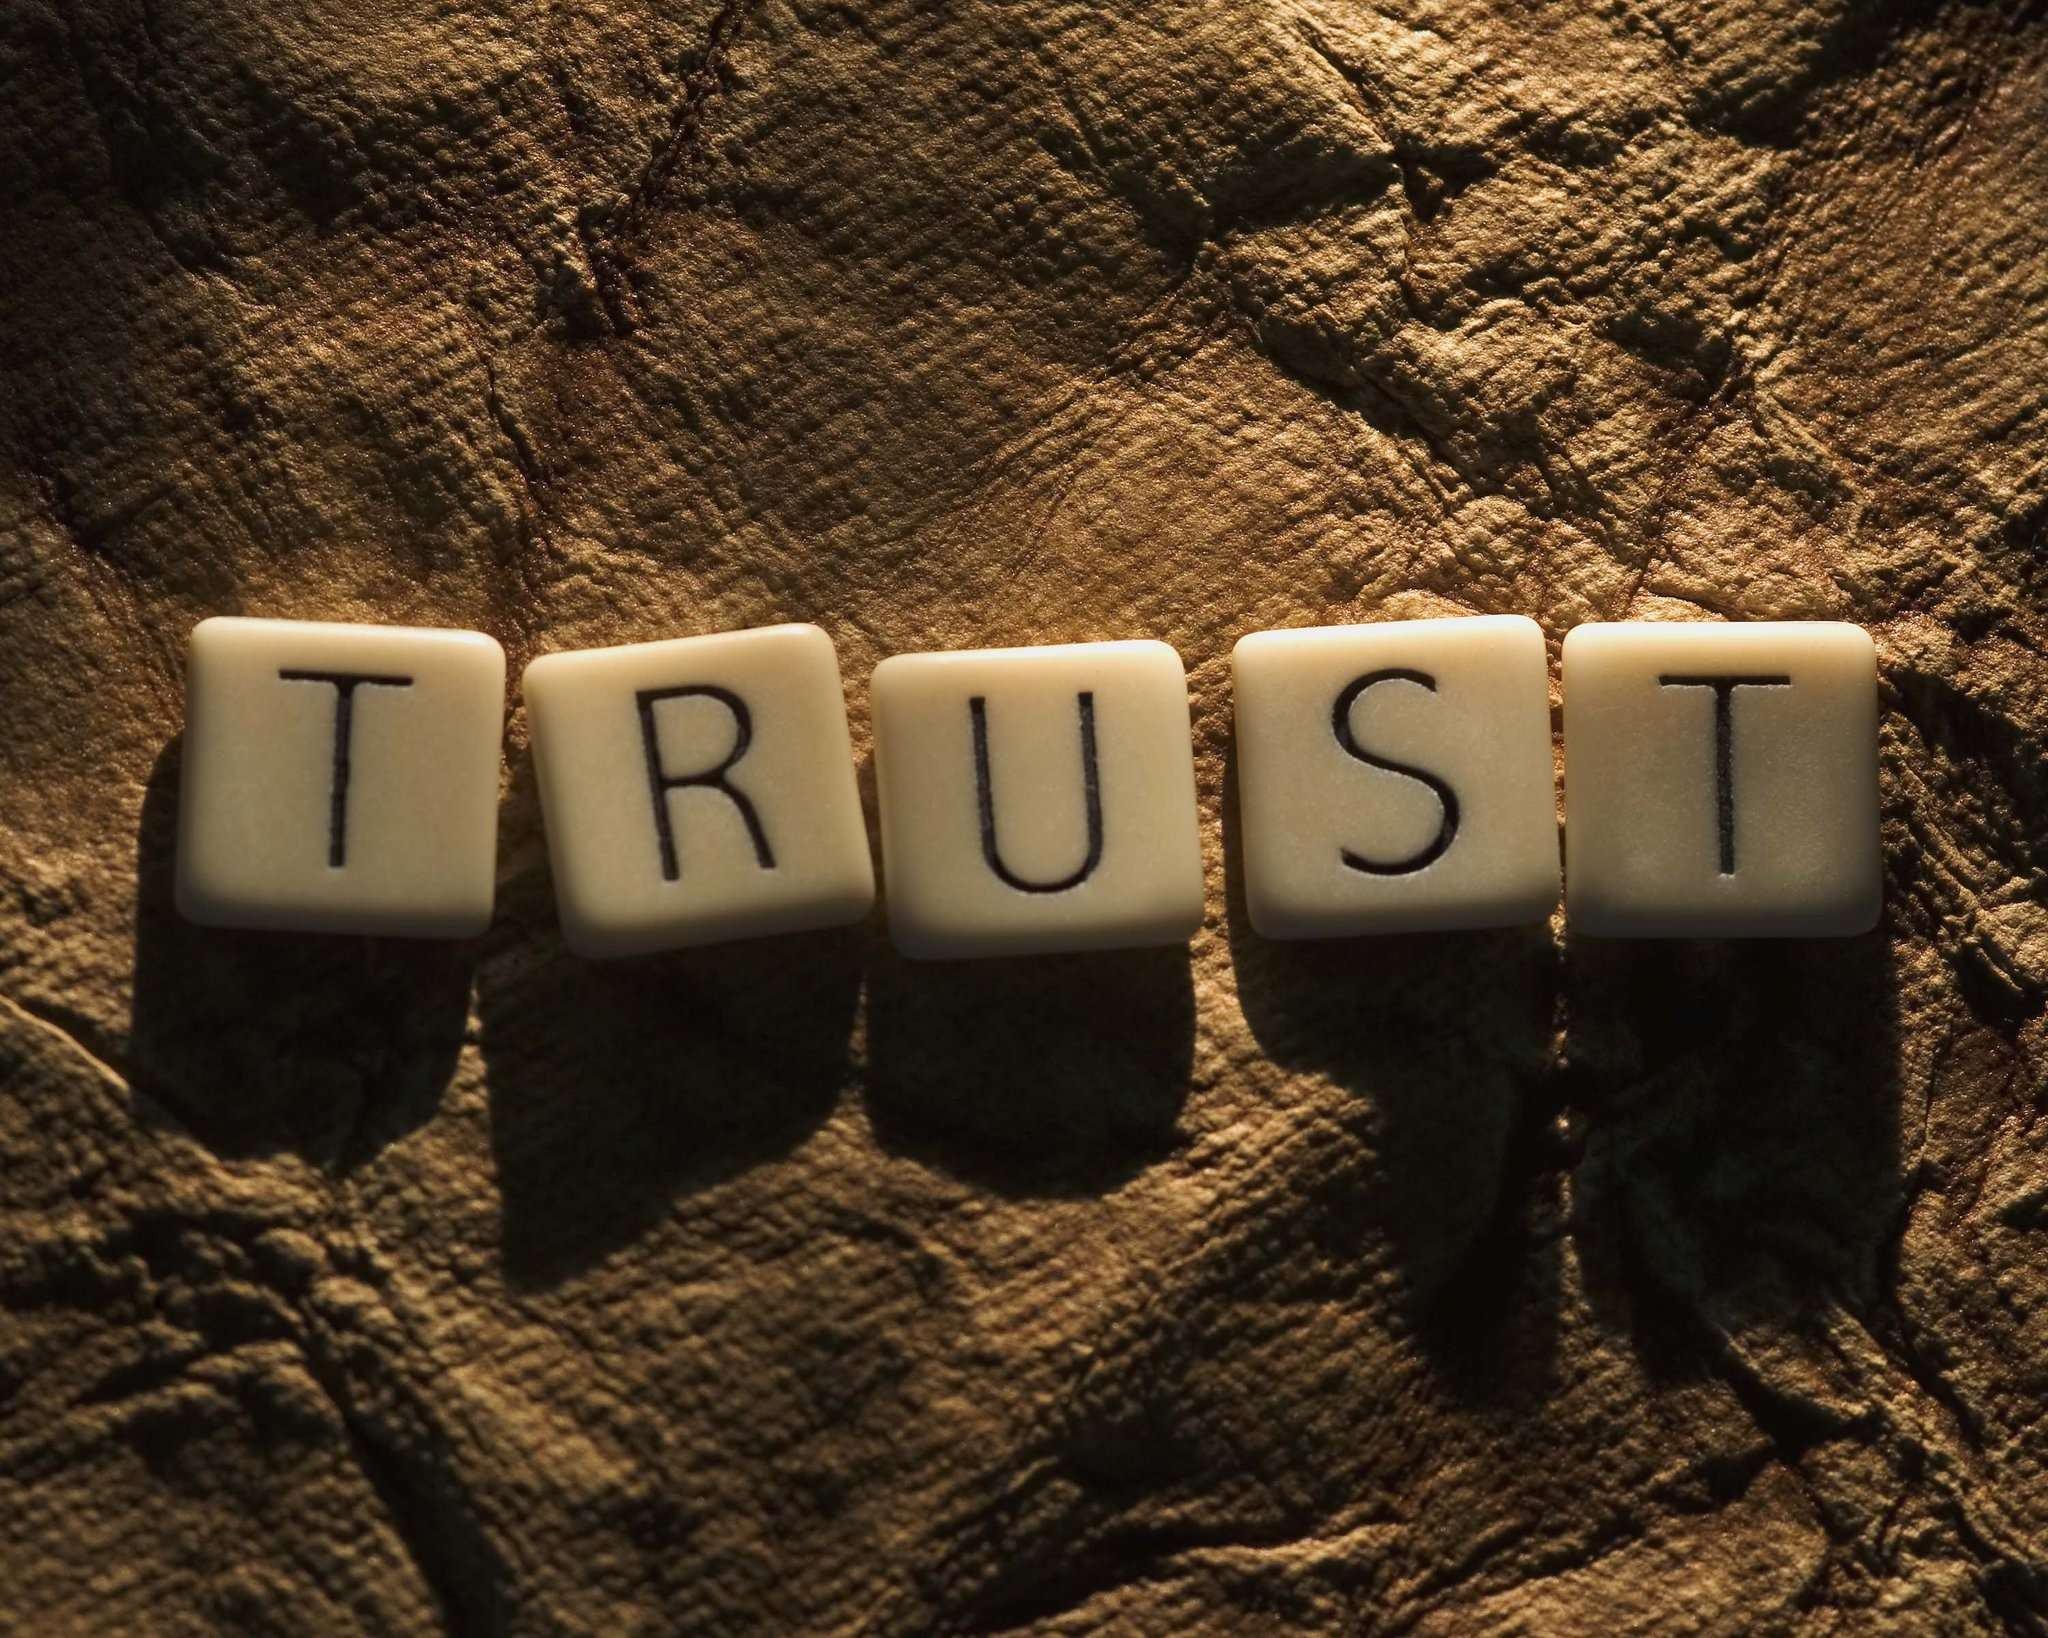 christian wallpapers trust